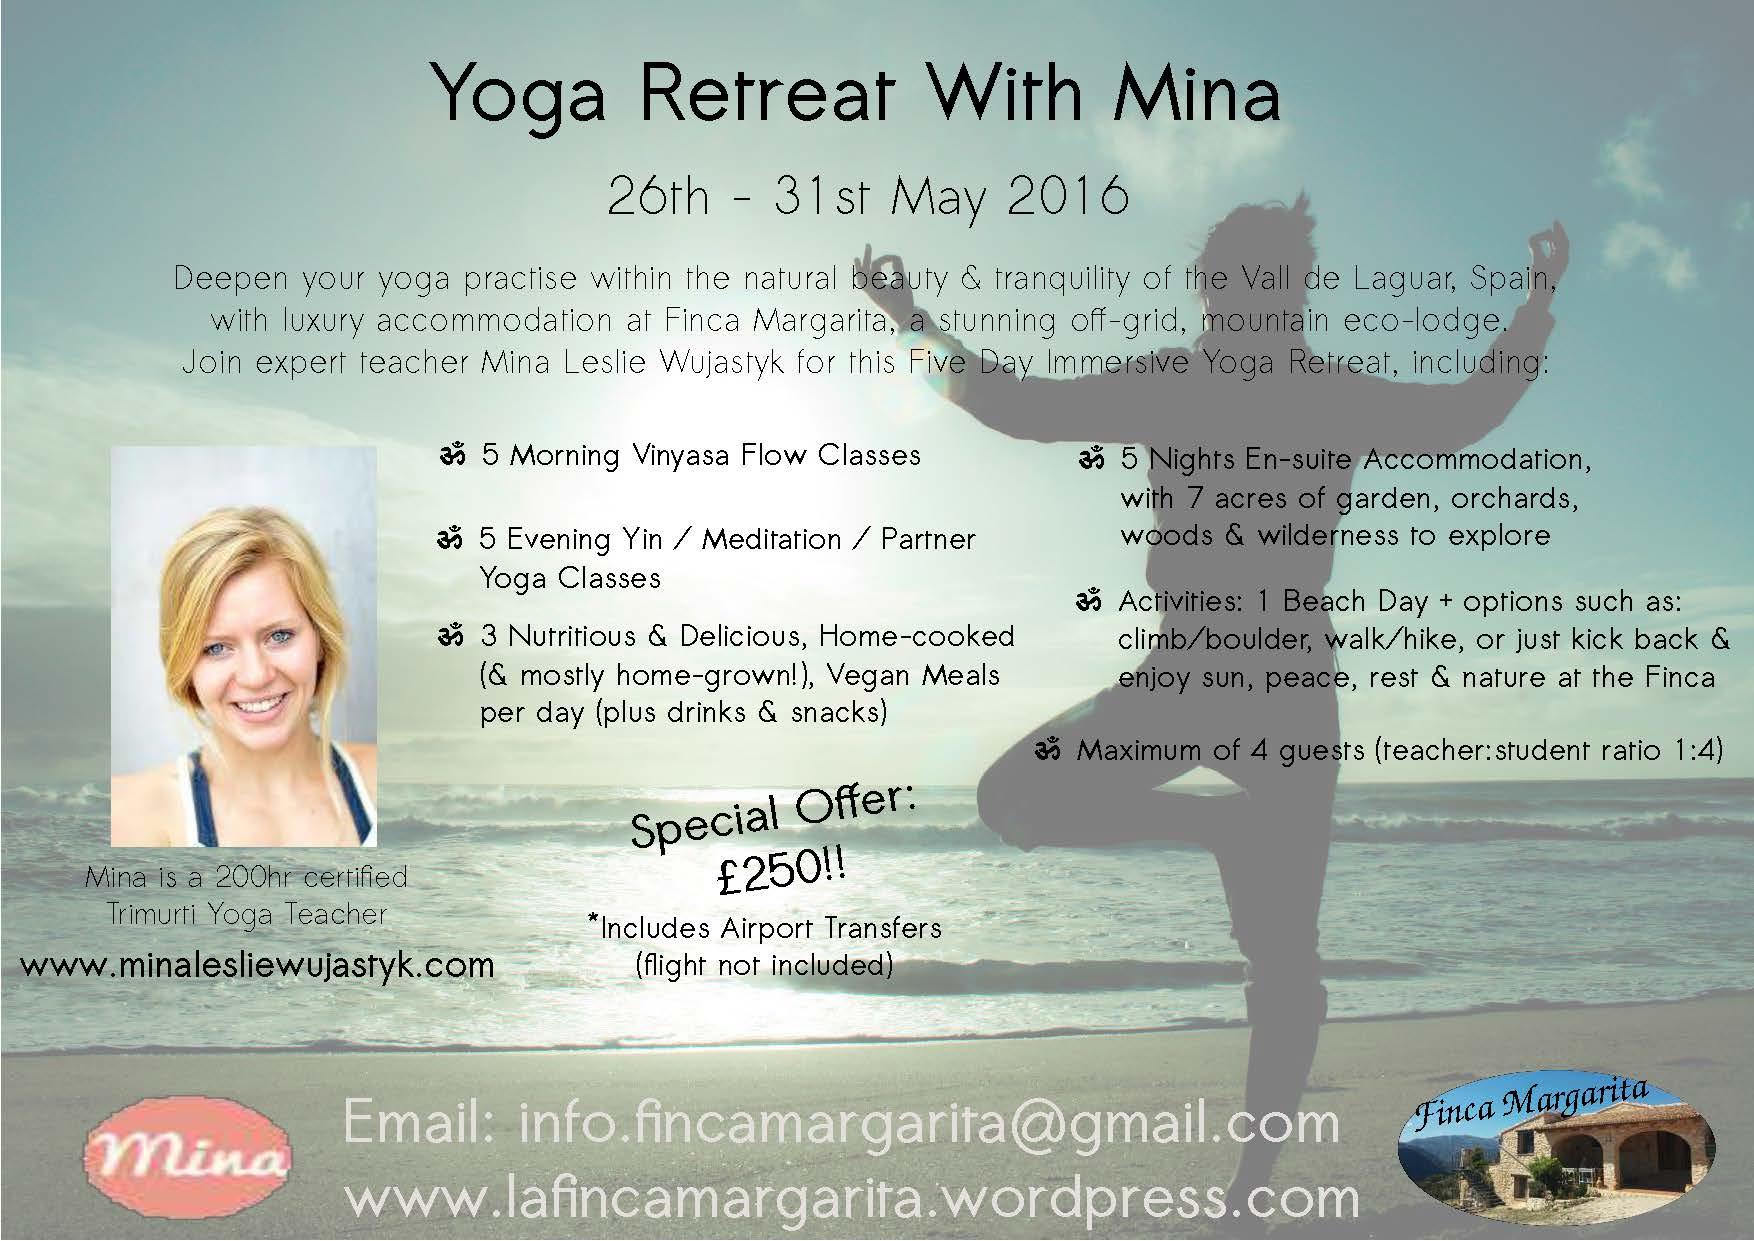 Mina Yoga Retreat Flyer Draft 3pressedjpg